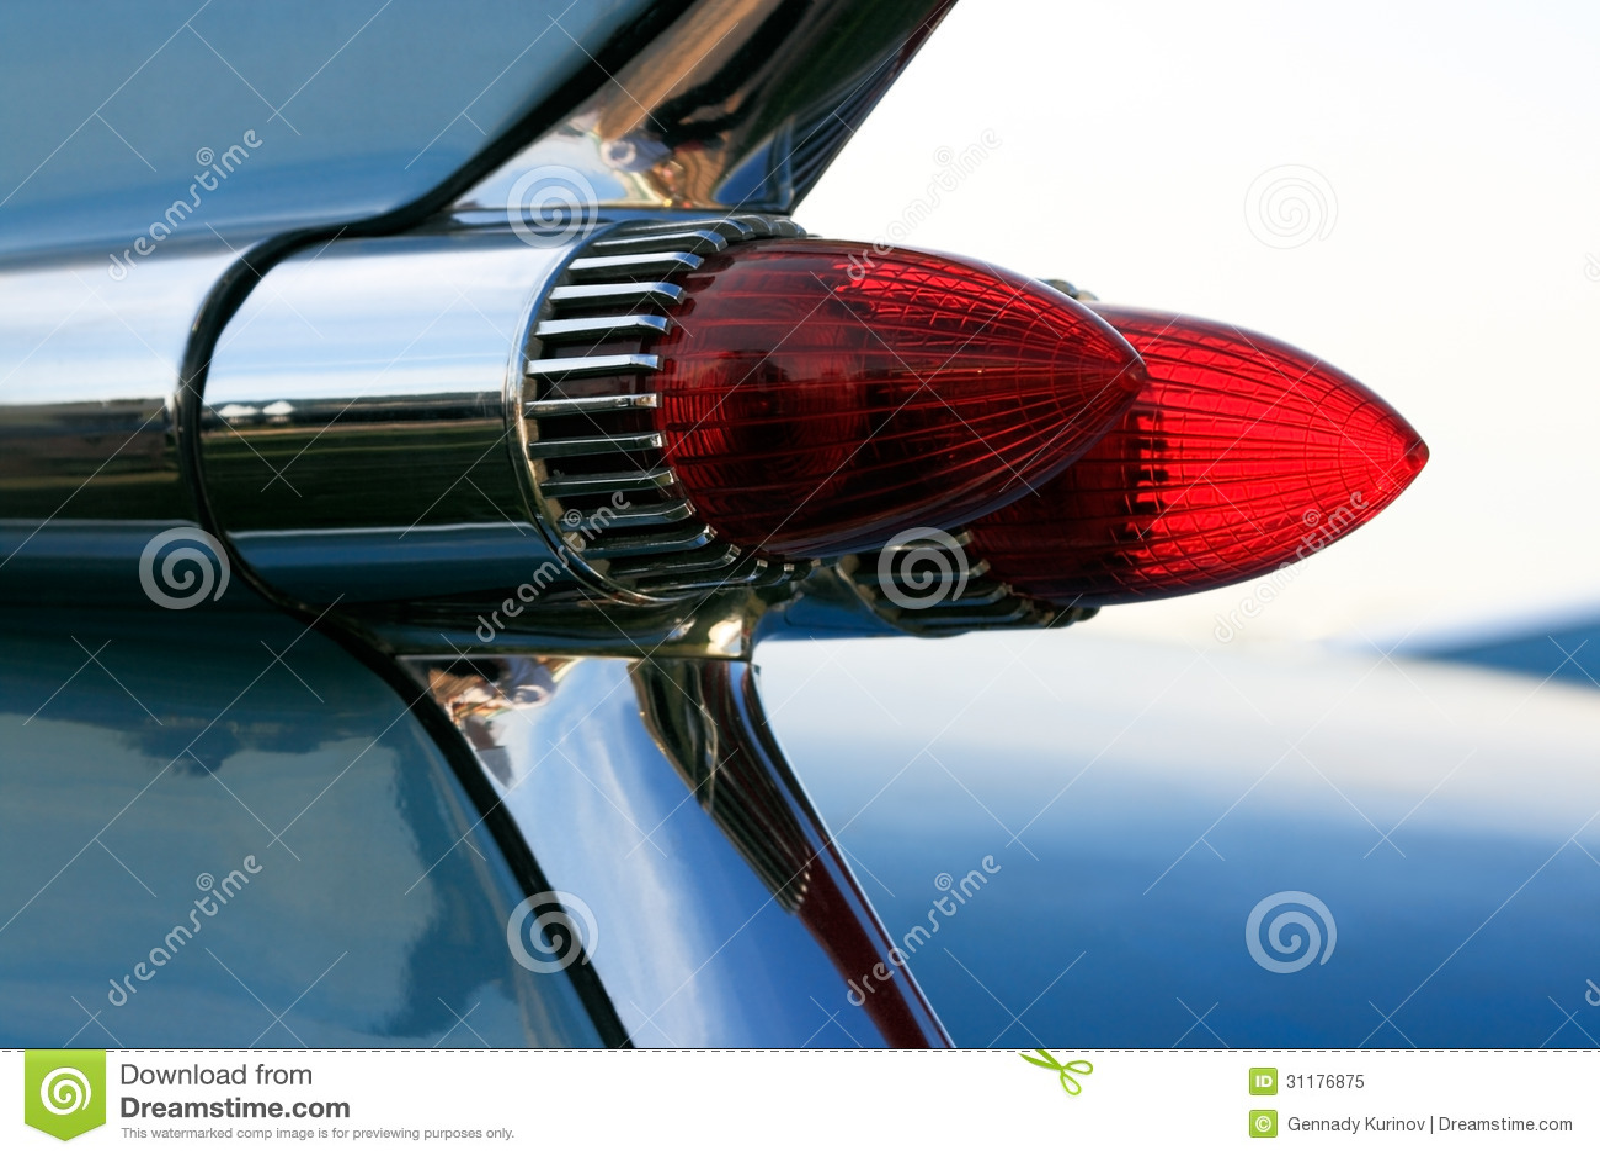 Vintage Auto Headlight Styles : Classic car tail lights royalty free stock photo image